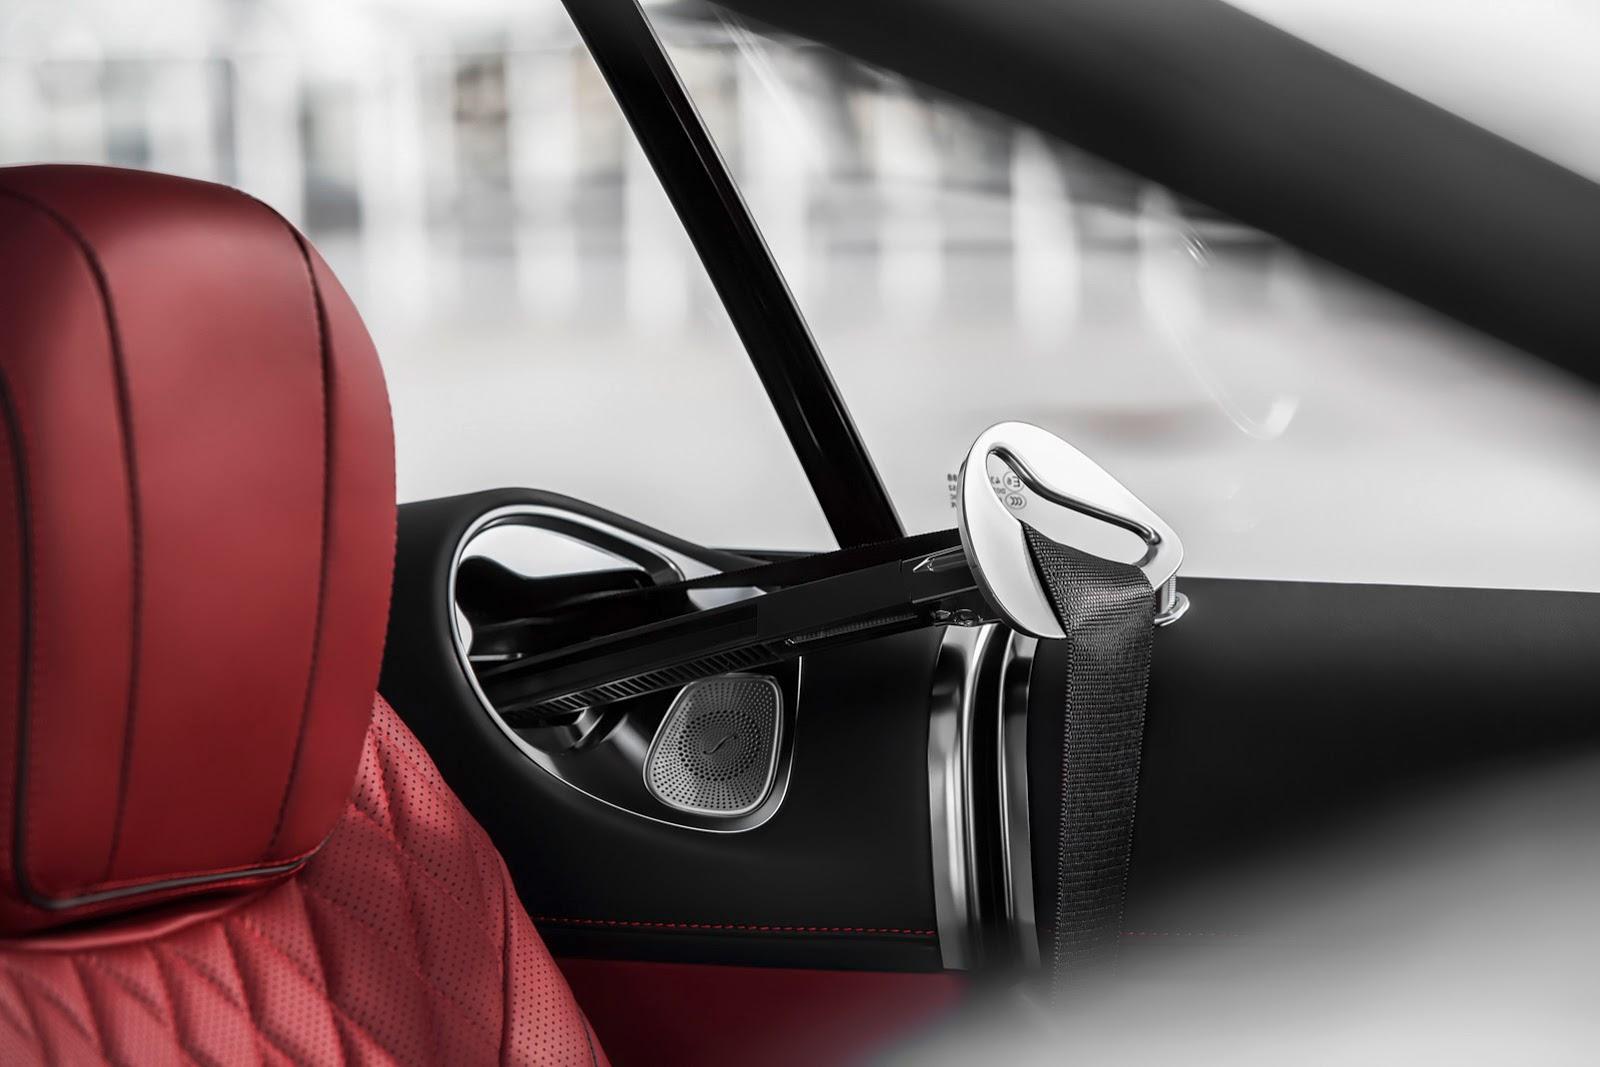 Mercedes-Benz S-class Coupe seat belt